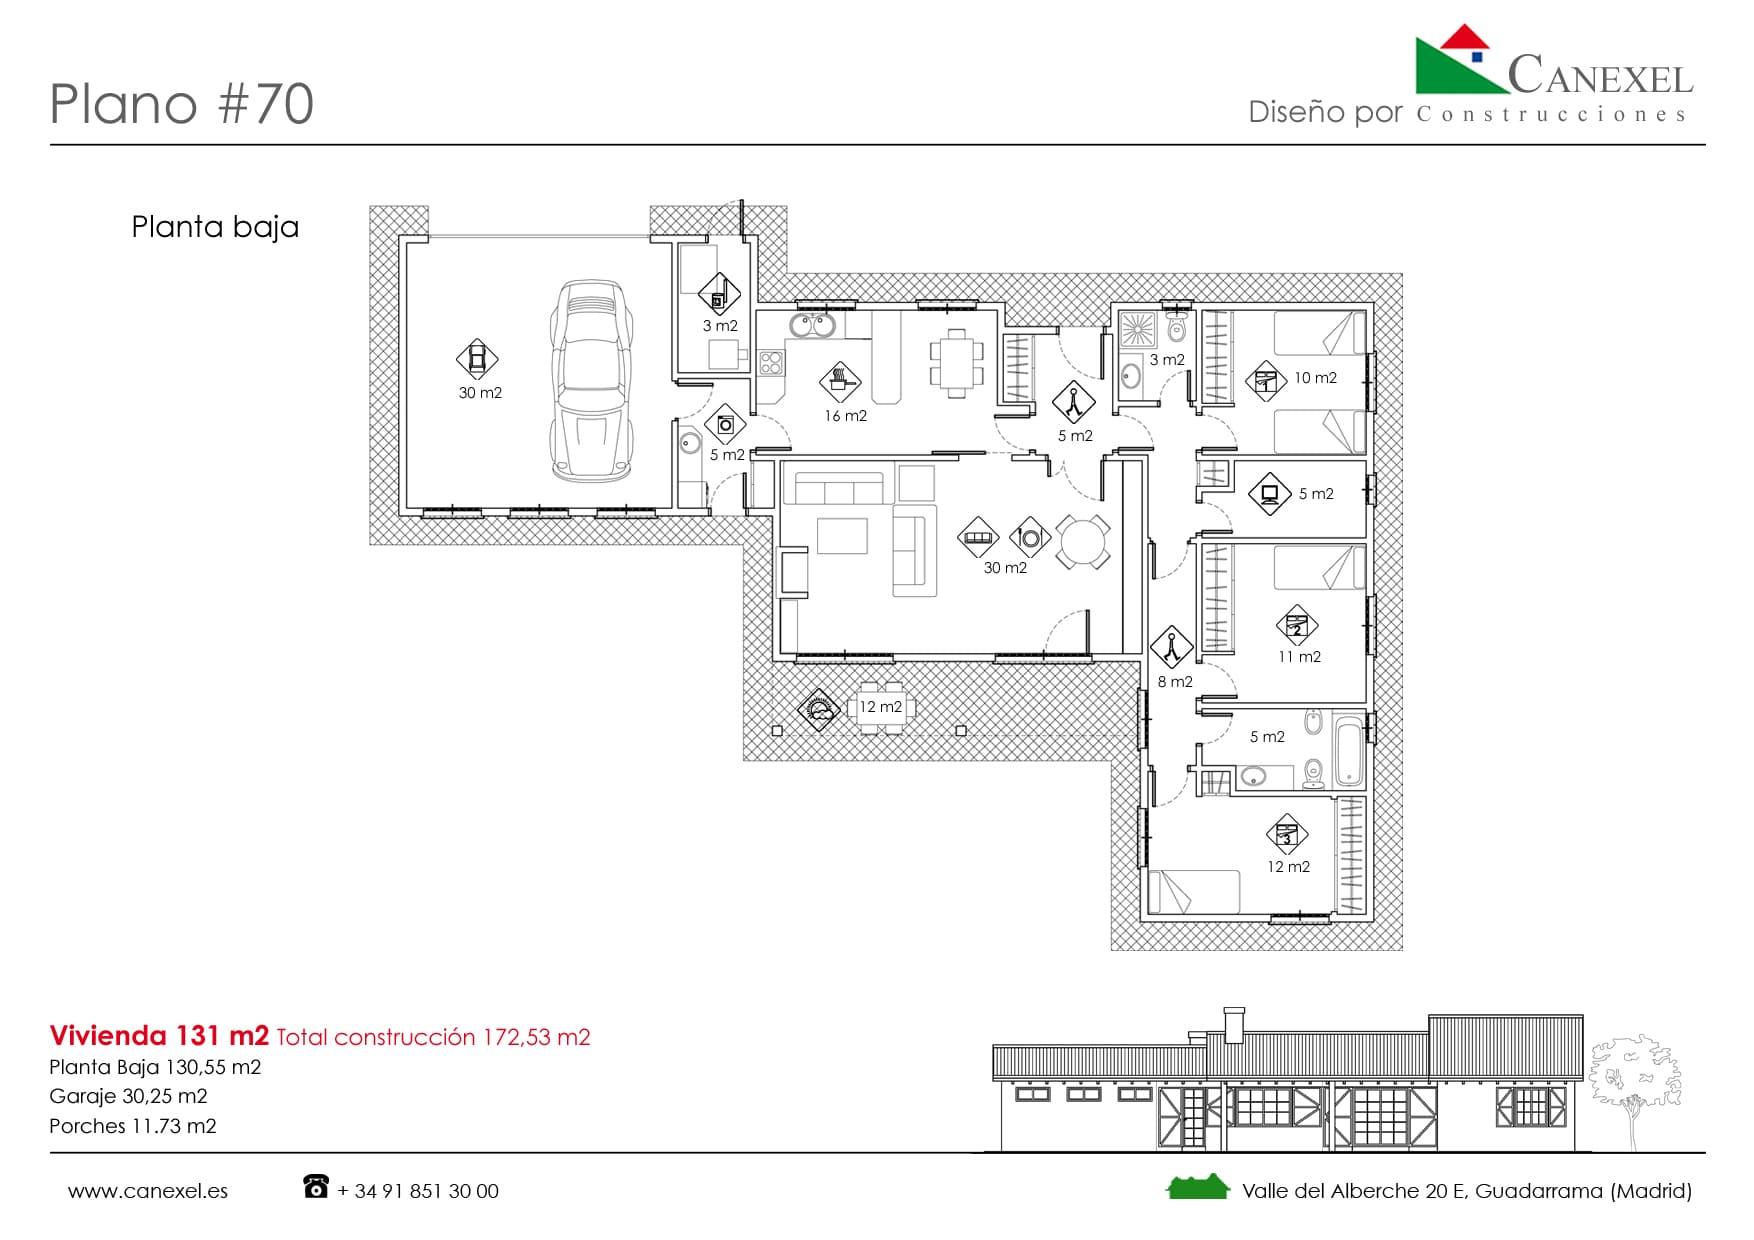 Disenos de chalet modernos cholets new aymaran mansions for Planos de chalets modernos